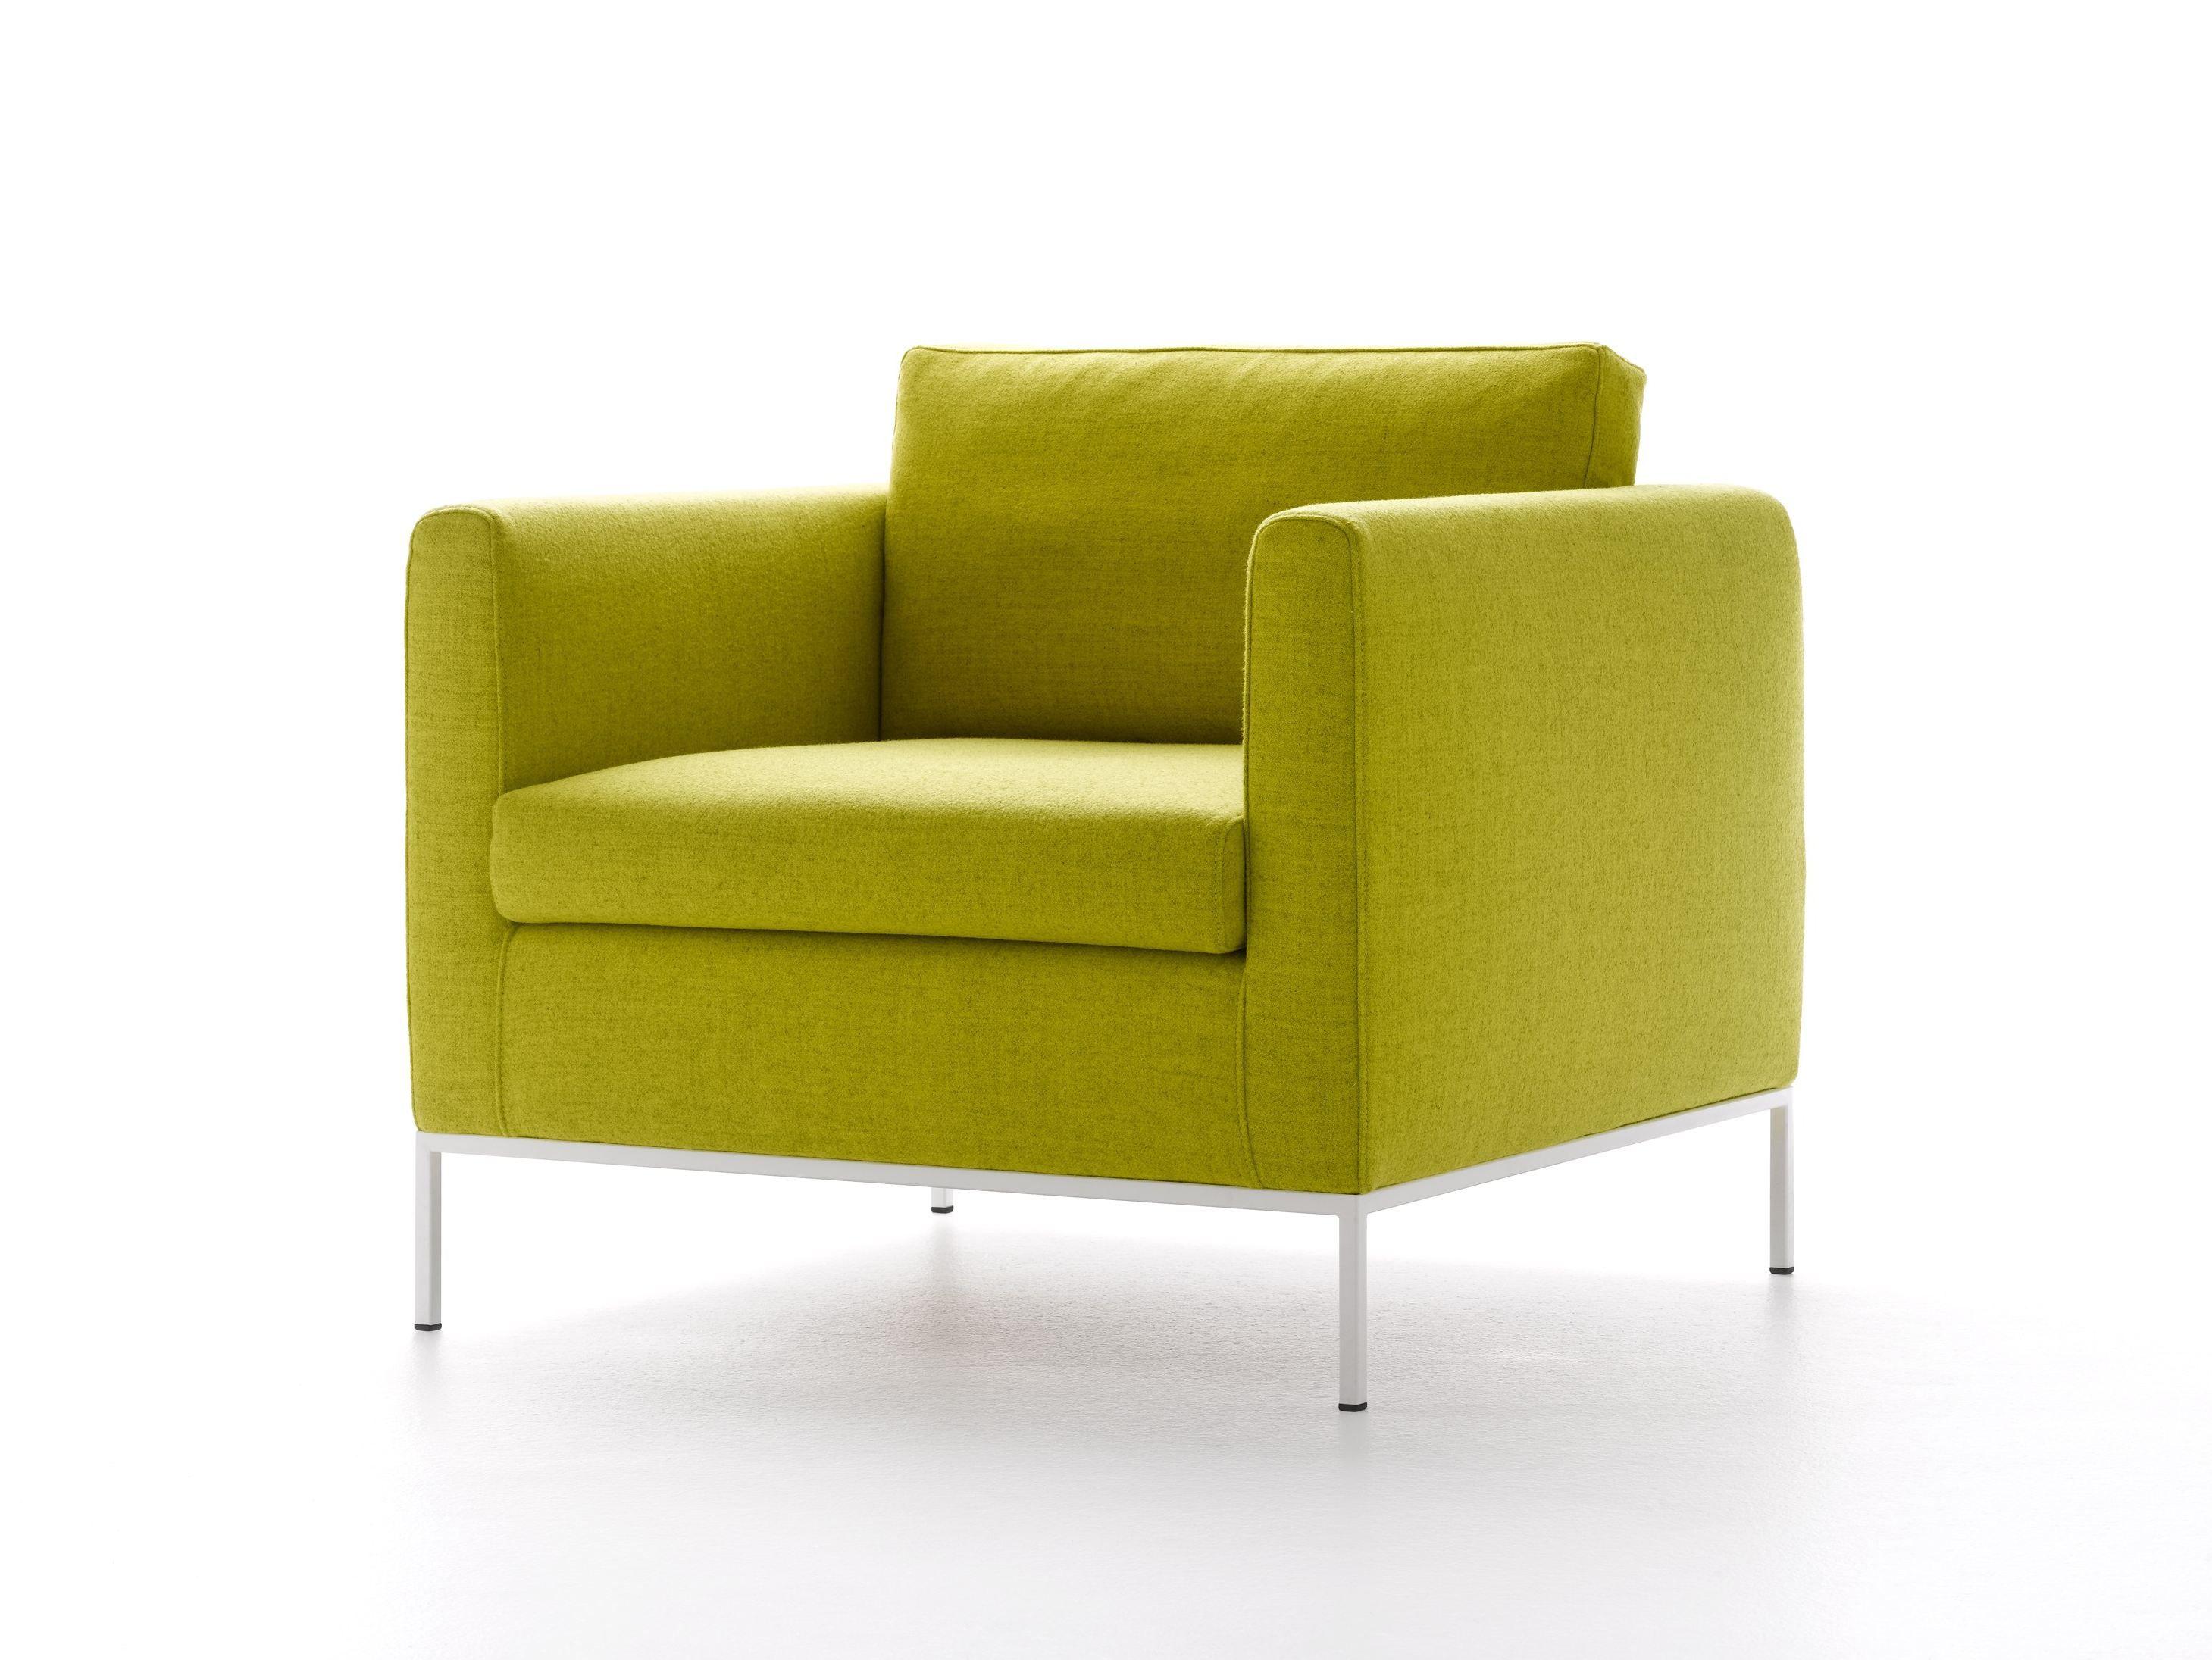 PAD-3-0-Fabric-armchair-MDF-Italia-228122-rel5f178a2f Schöne Mia and Me Stoff Dekorationen